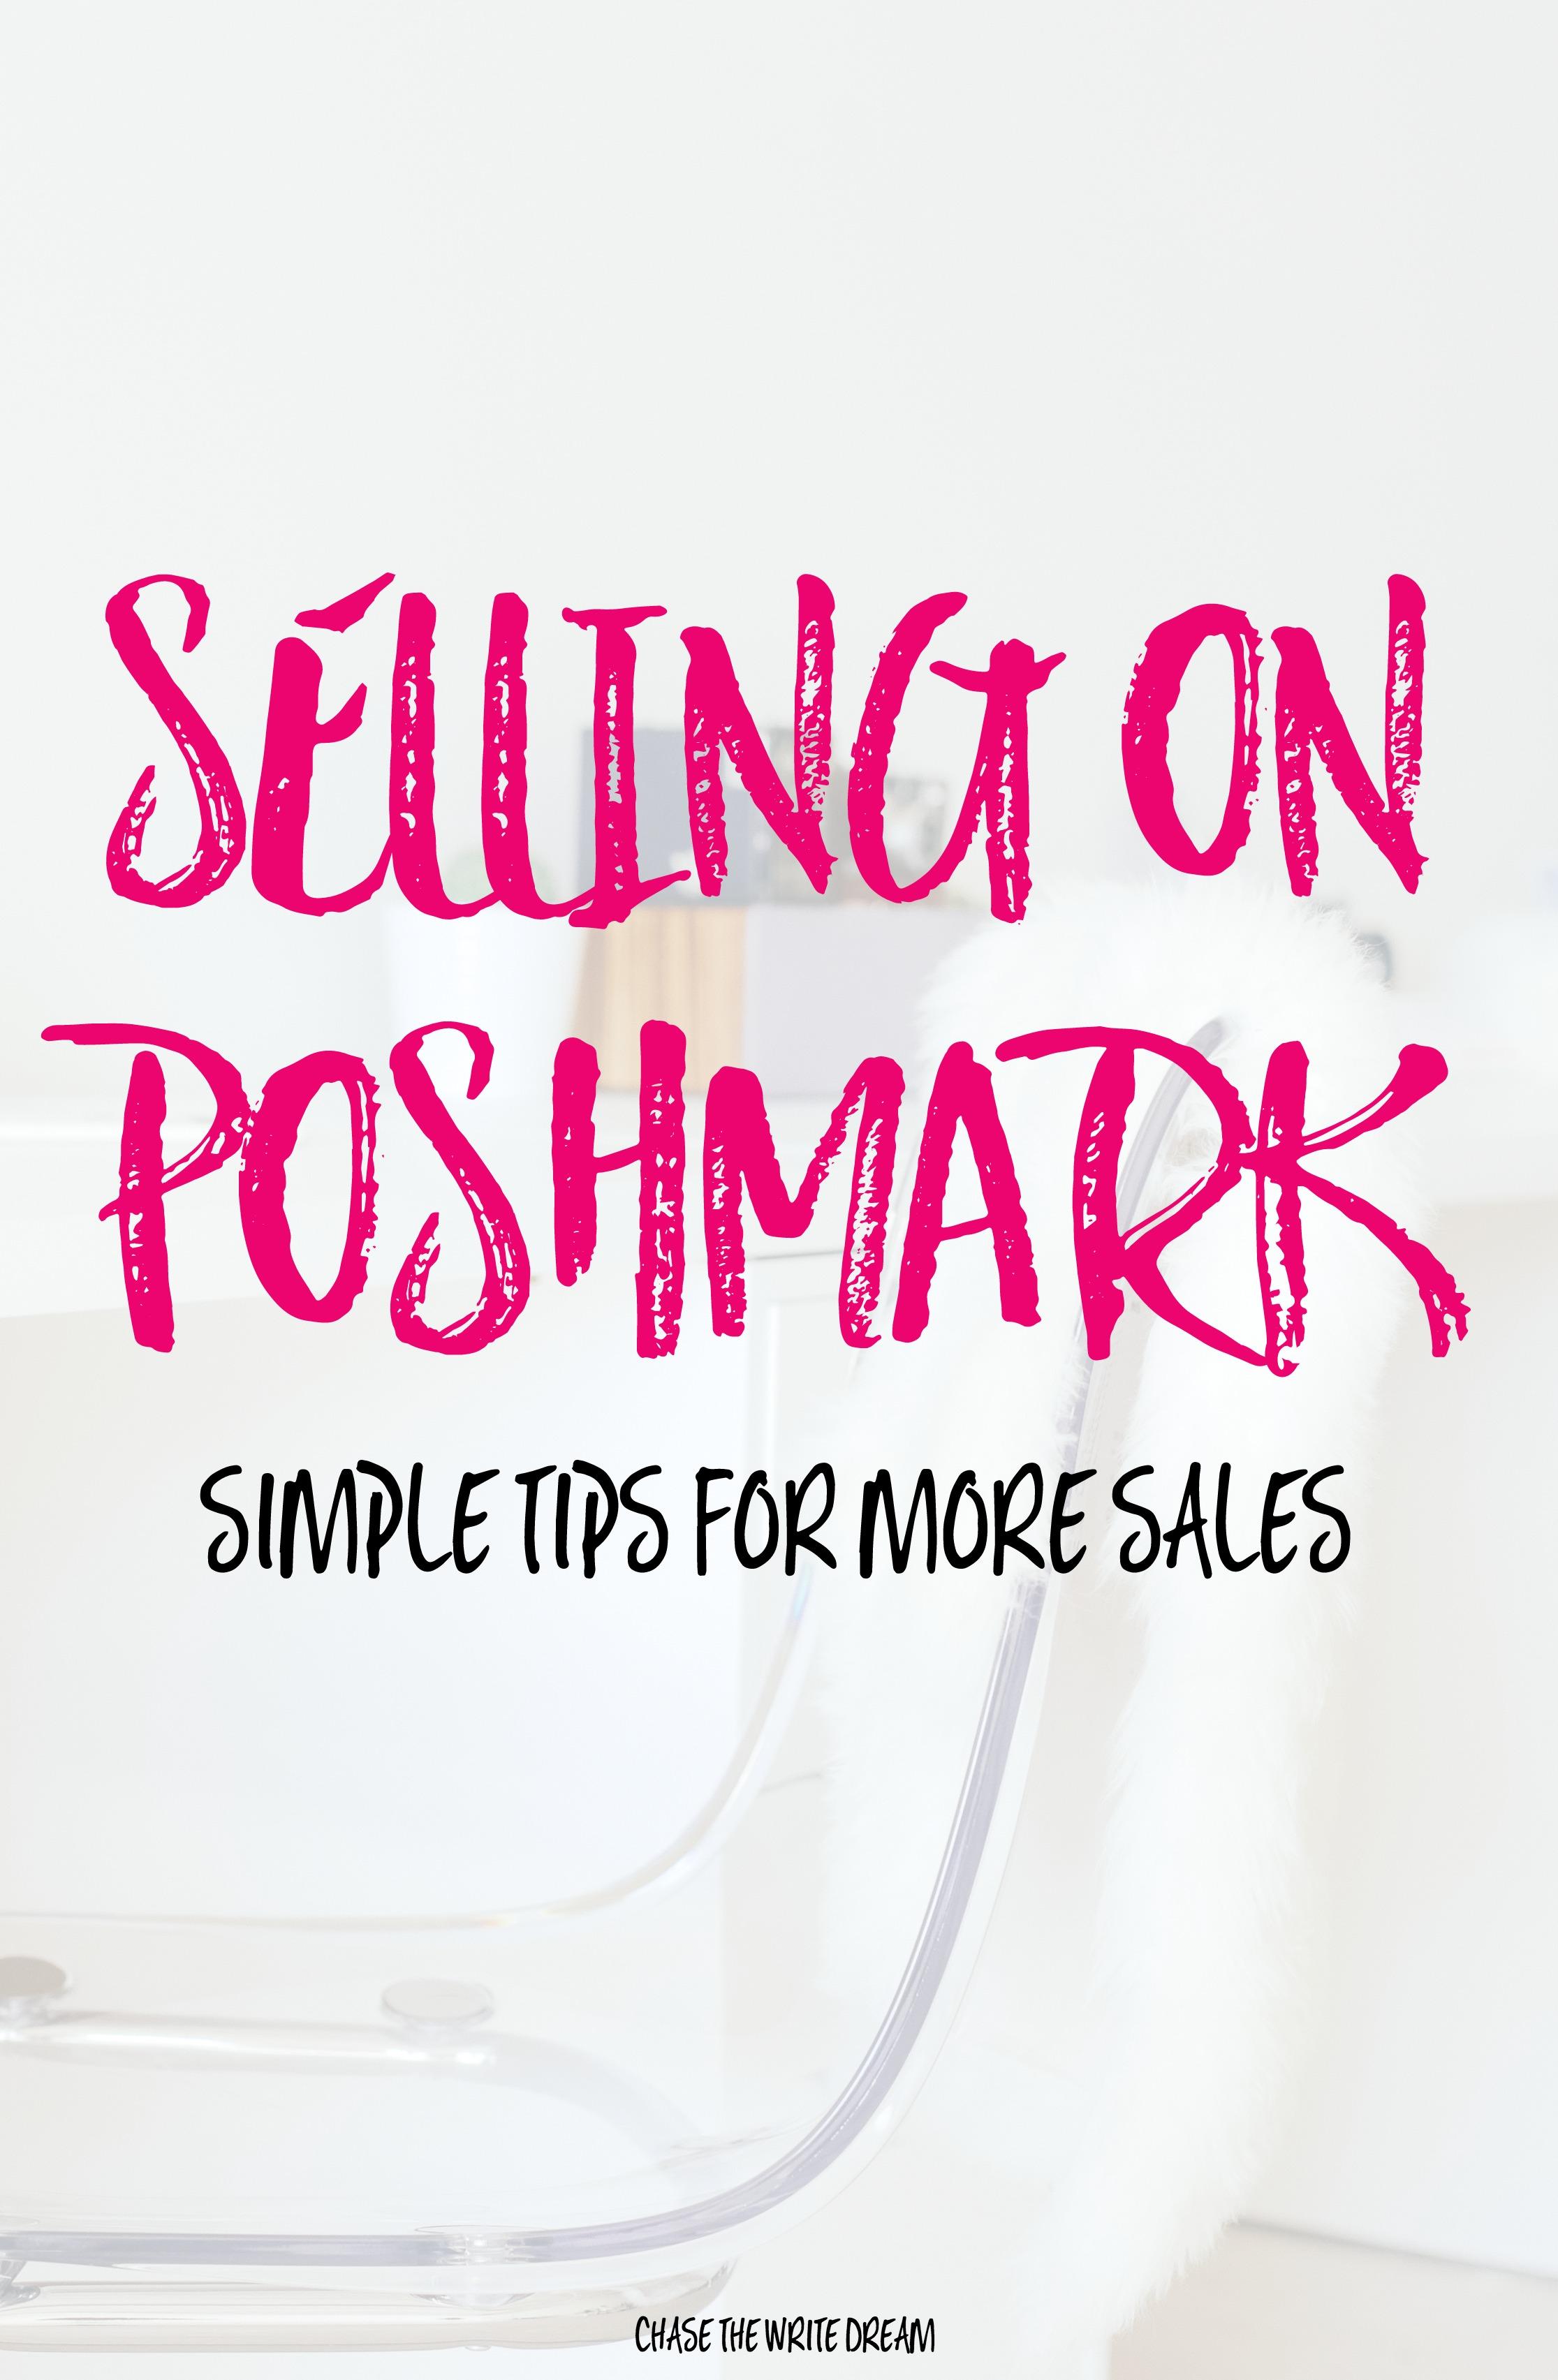 Poshmark cash flow positive, on track for $100 million